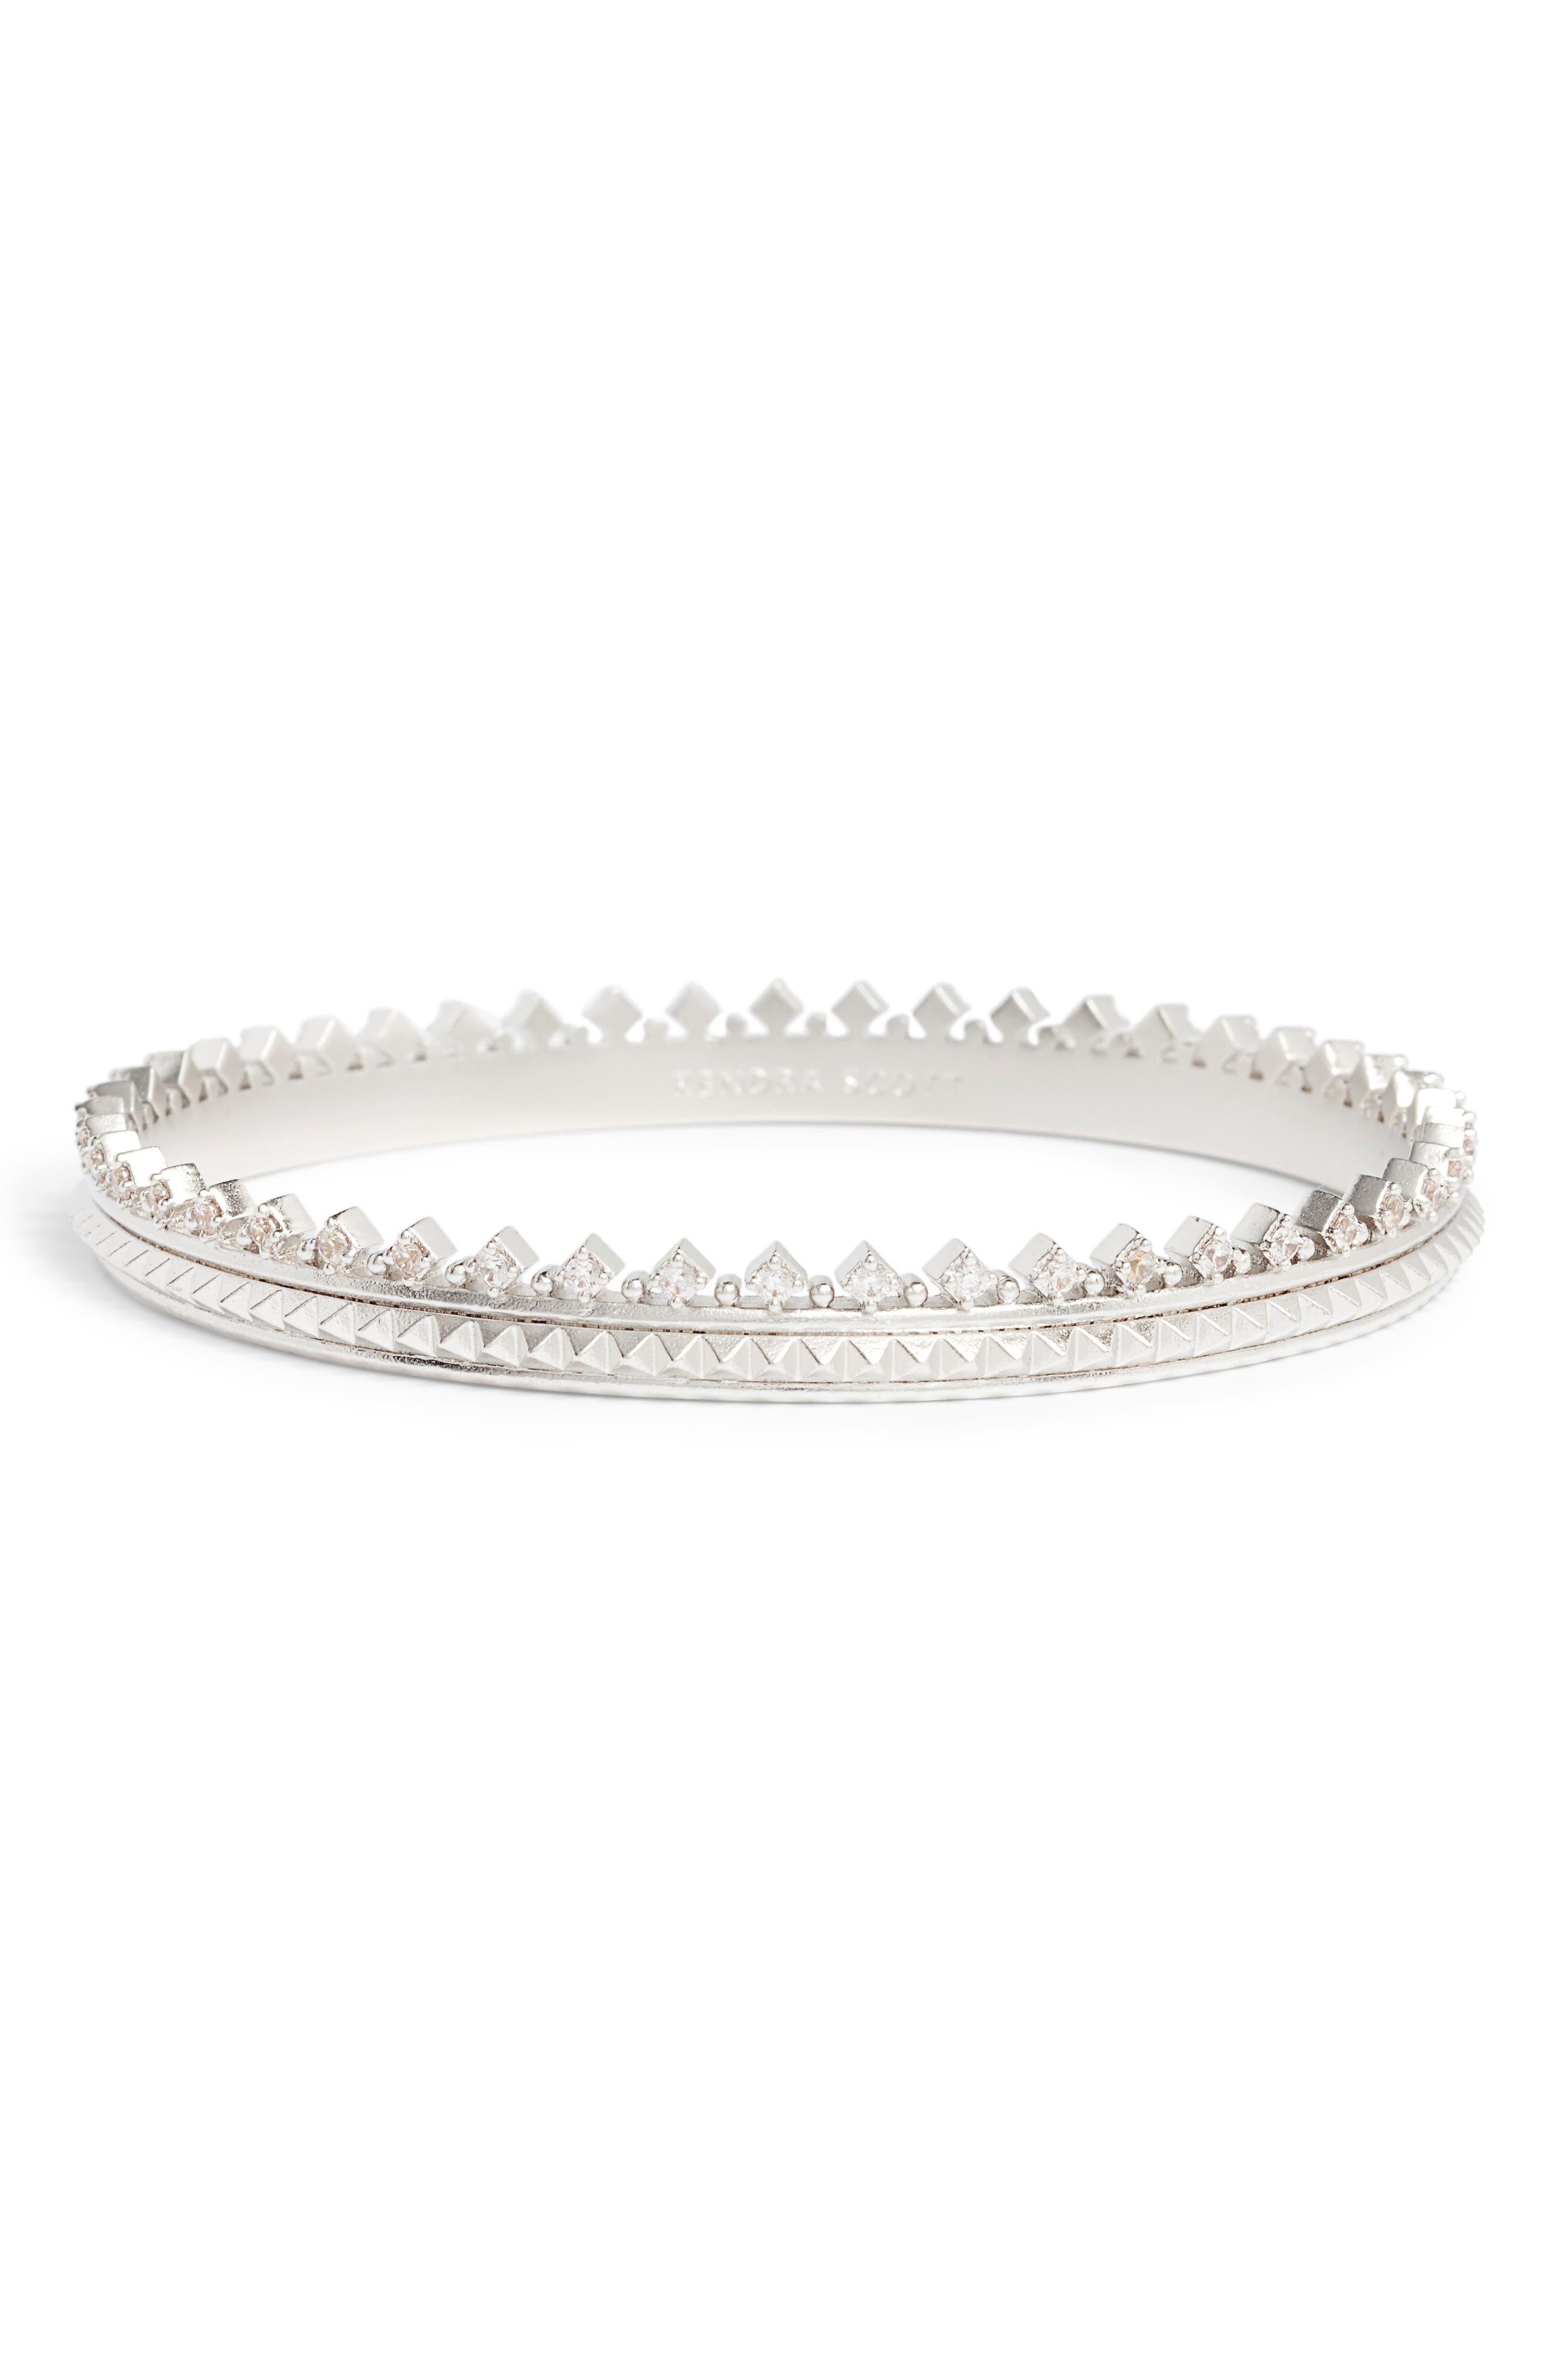 Mary Caroline Crystal Pyramid Cuff Bracelet,                         Main,                         color, 040